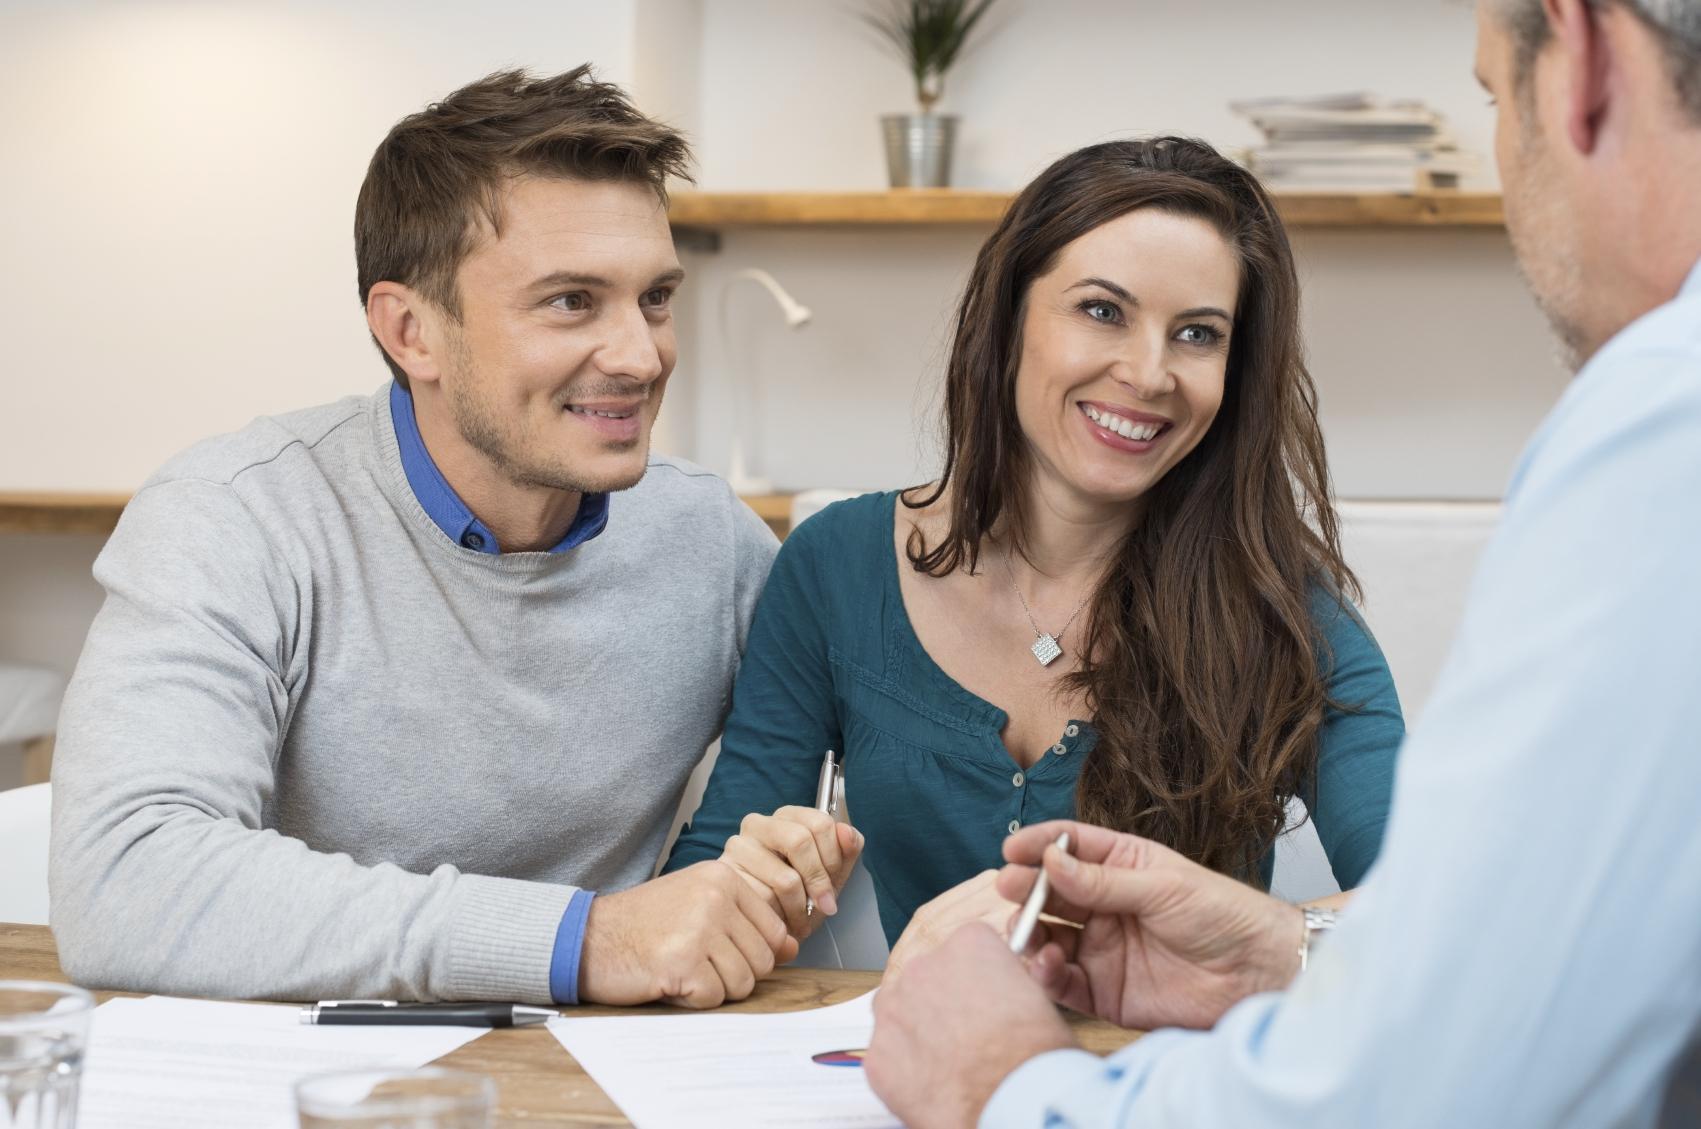 kredyti hipoteczny